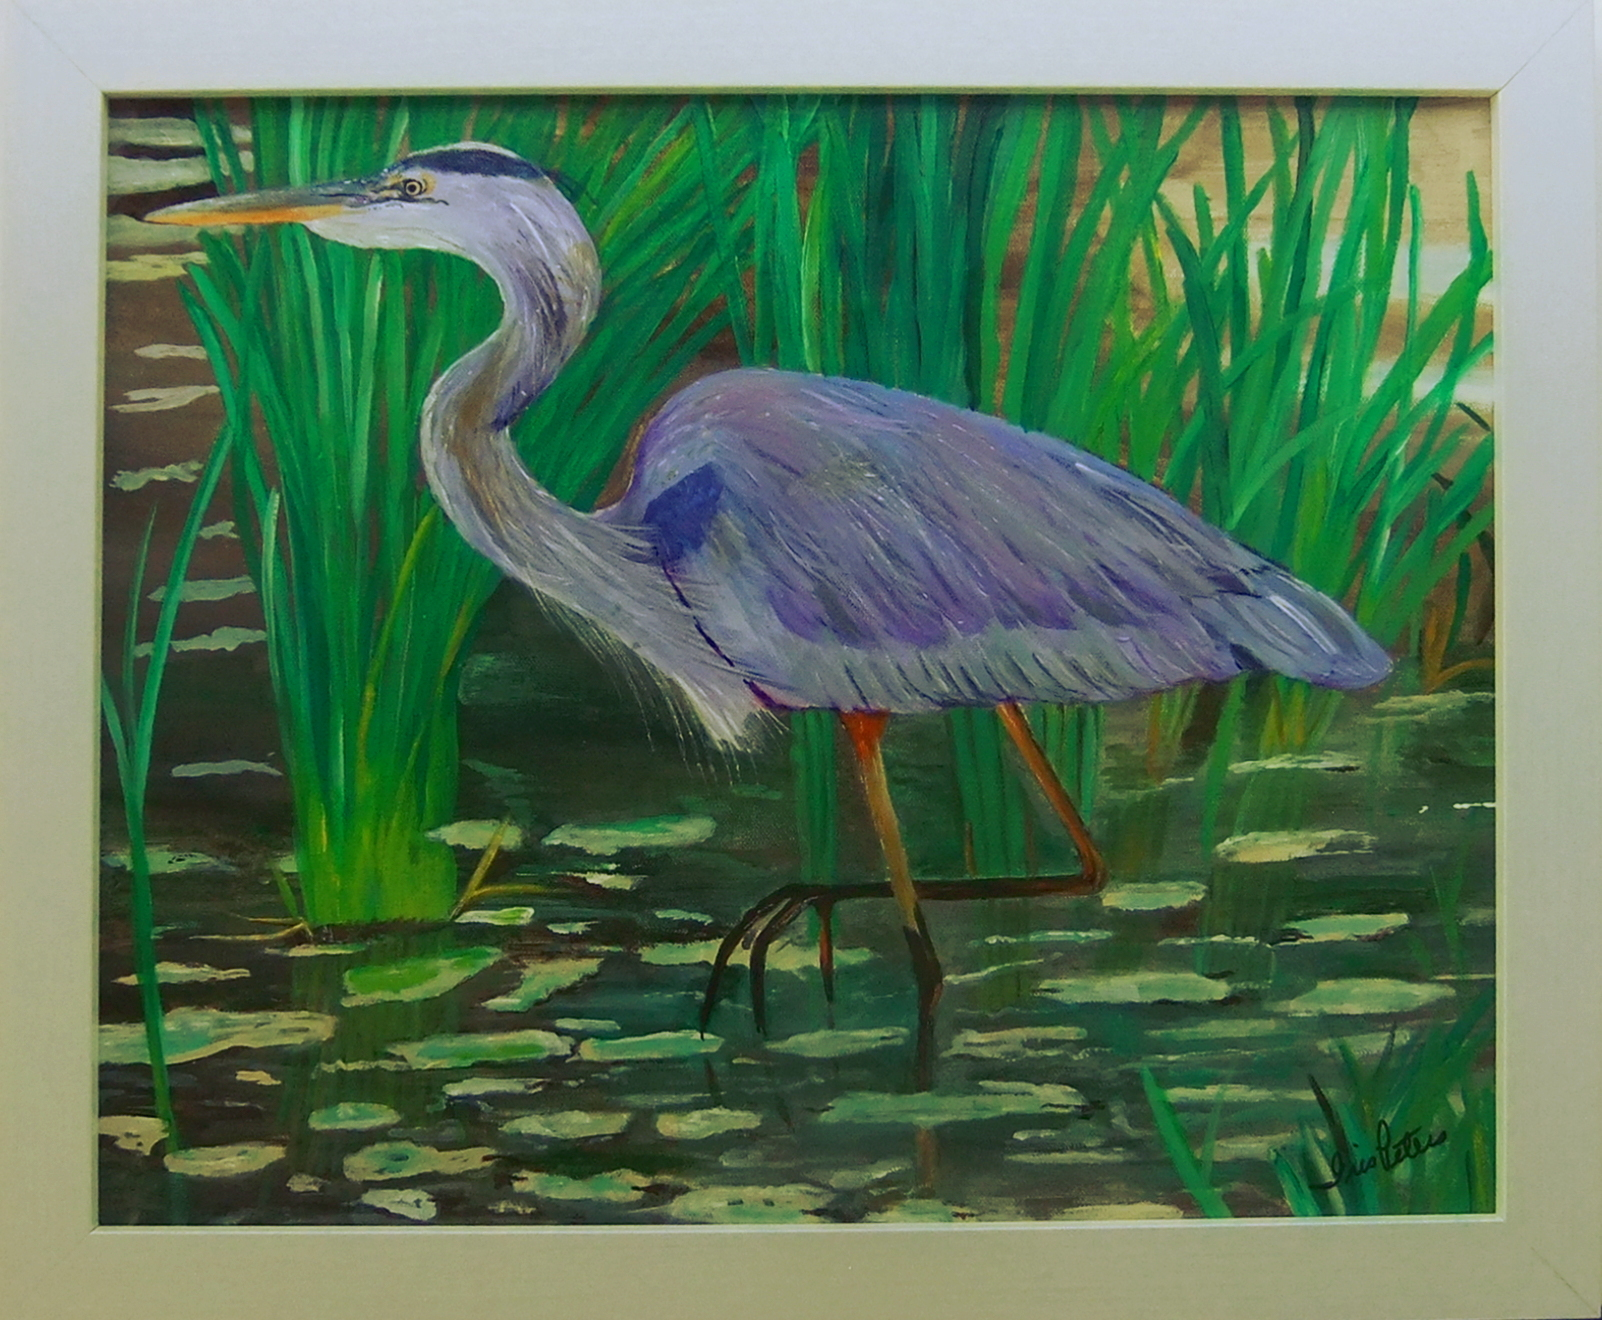 heron in the stream 20 x 18 $200